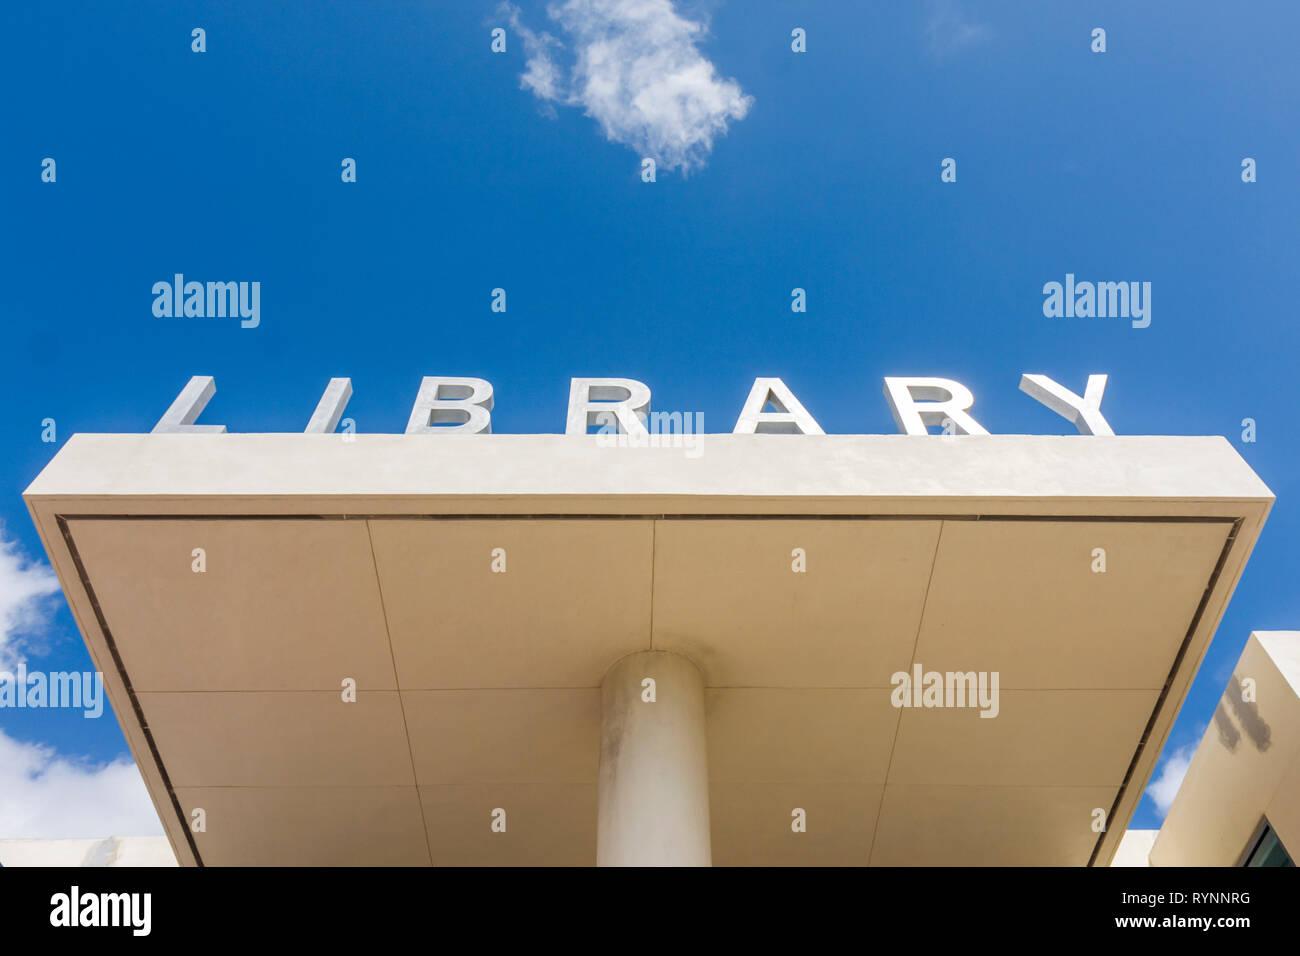 Miami Beach Miami Florida Beach Public Library sign exterior metal letters entrance building portico sky design - Stock Image